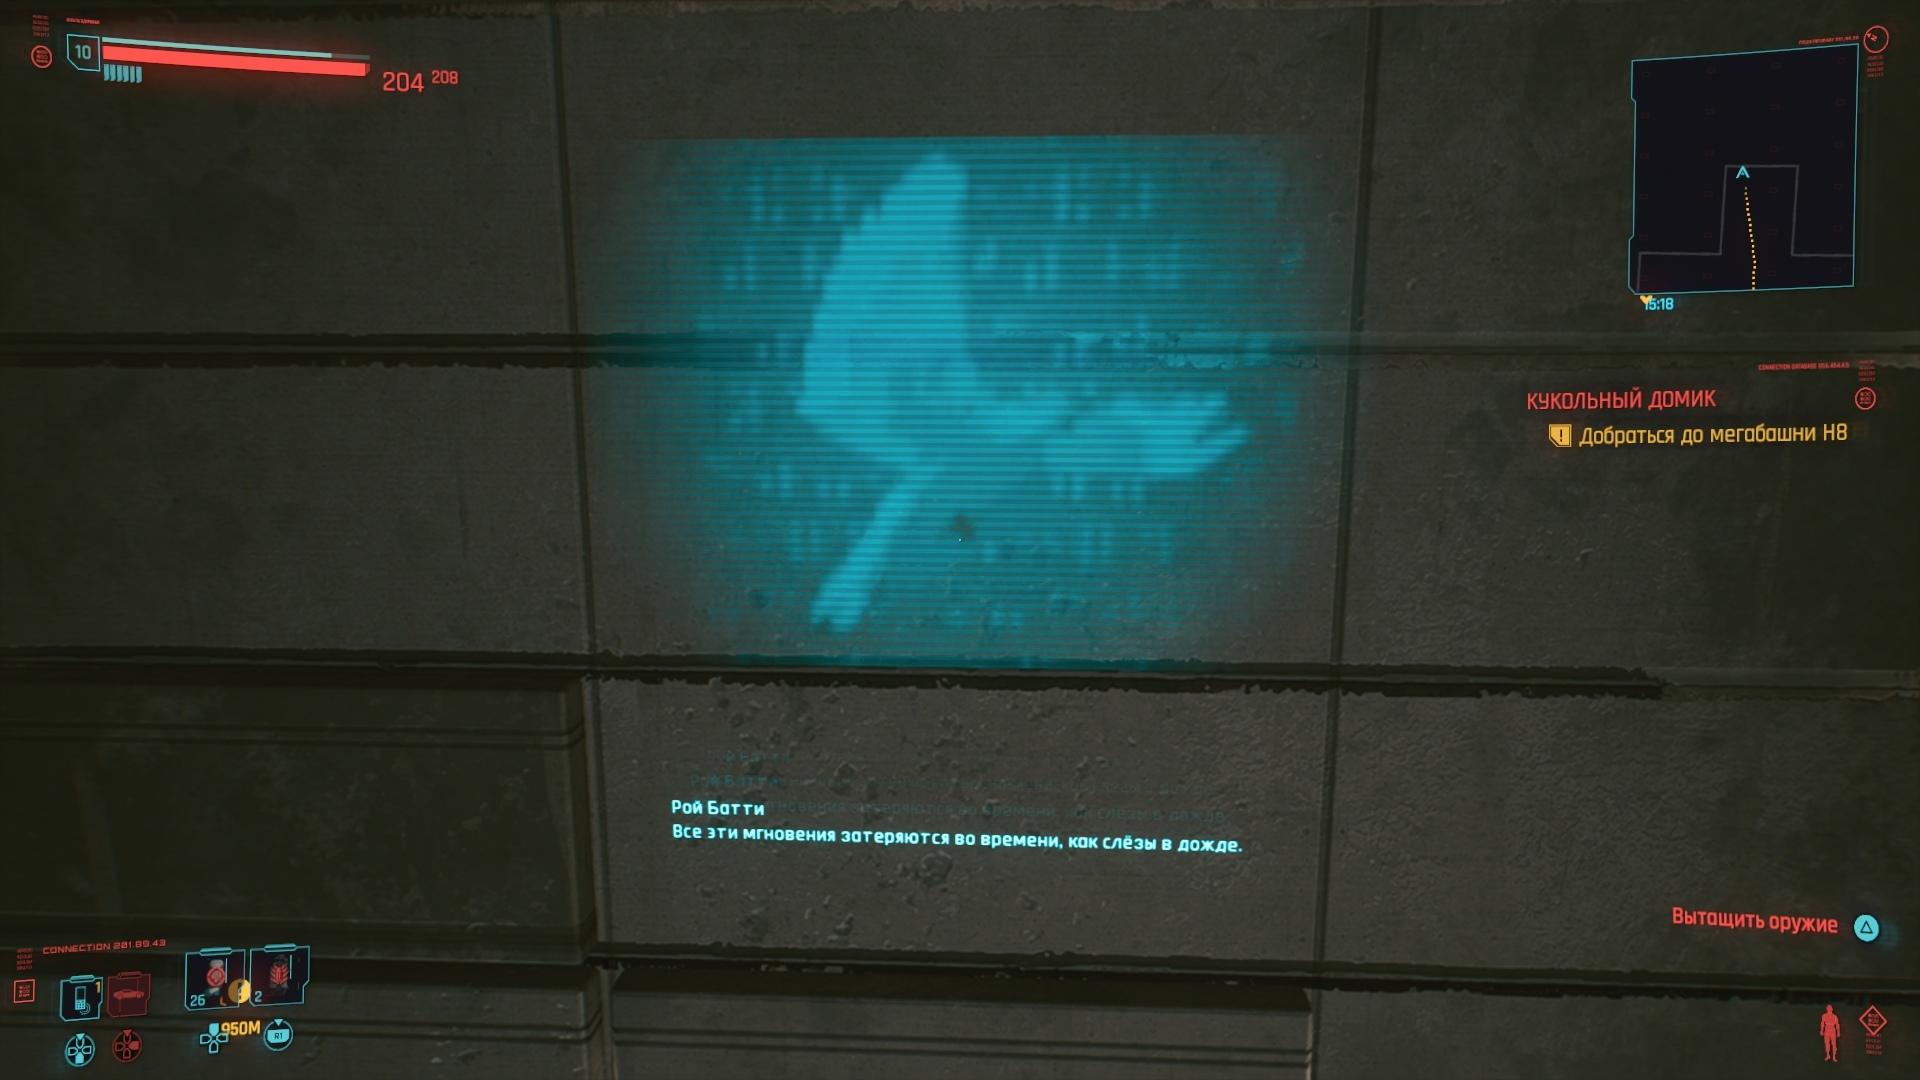 PZzScZzmQ2I.jpg - Cyberpunk 2077